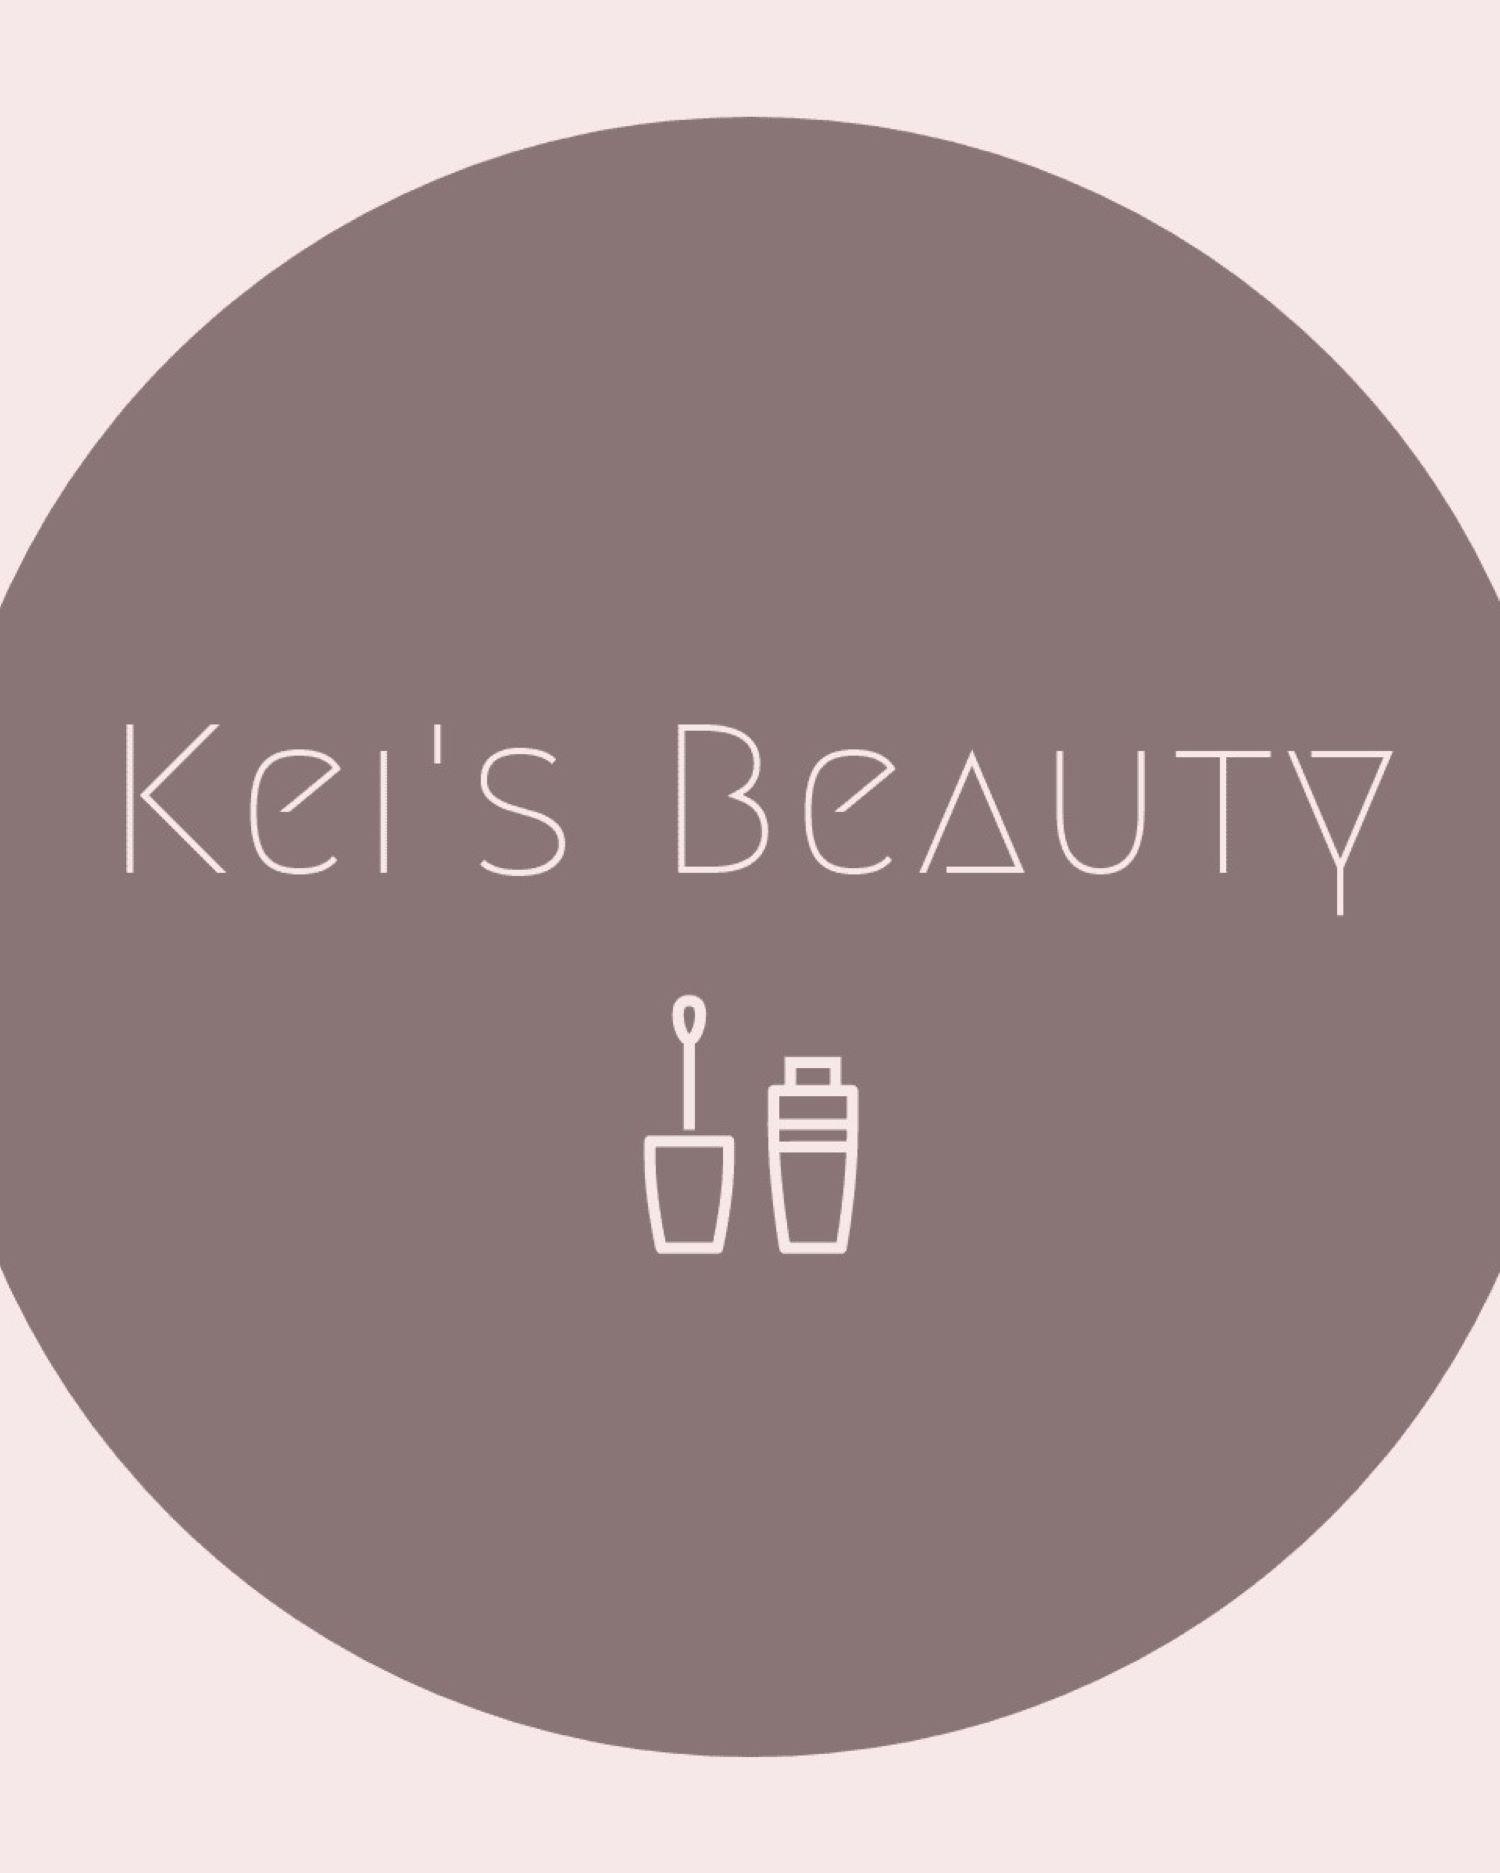 Keis Beauty LLC